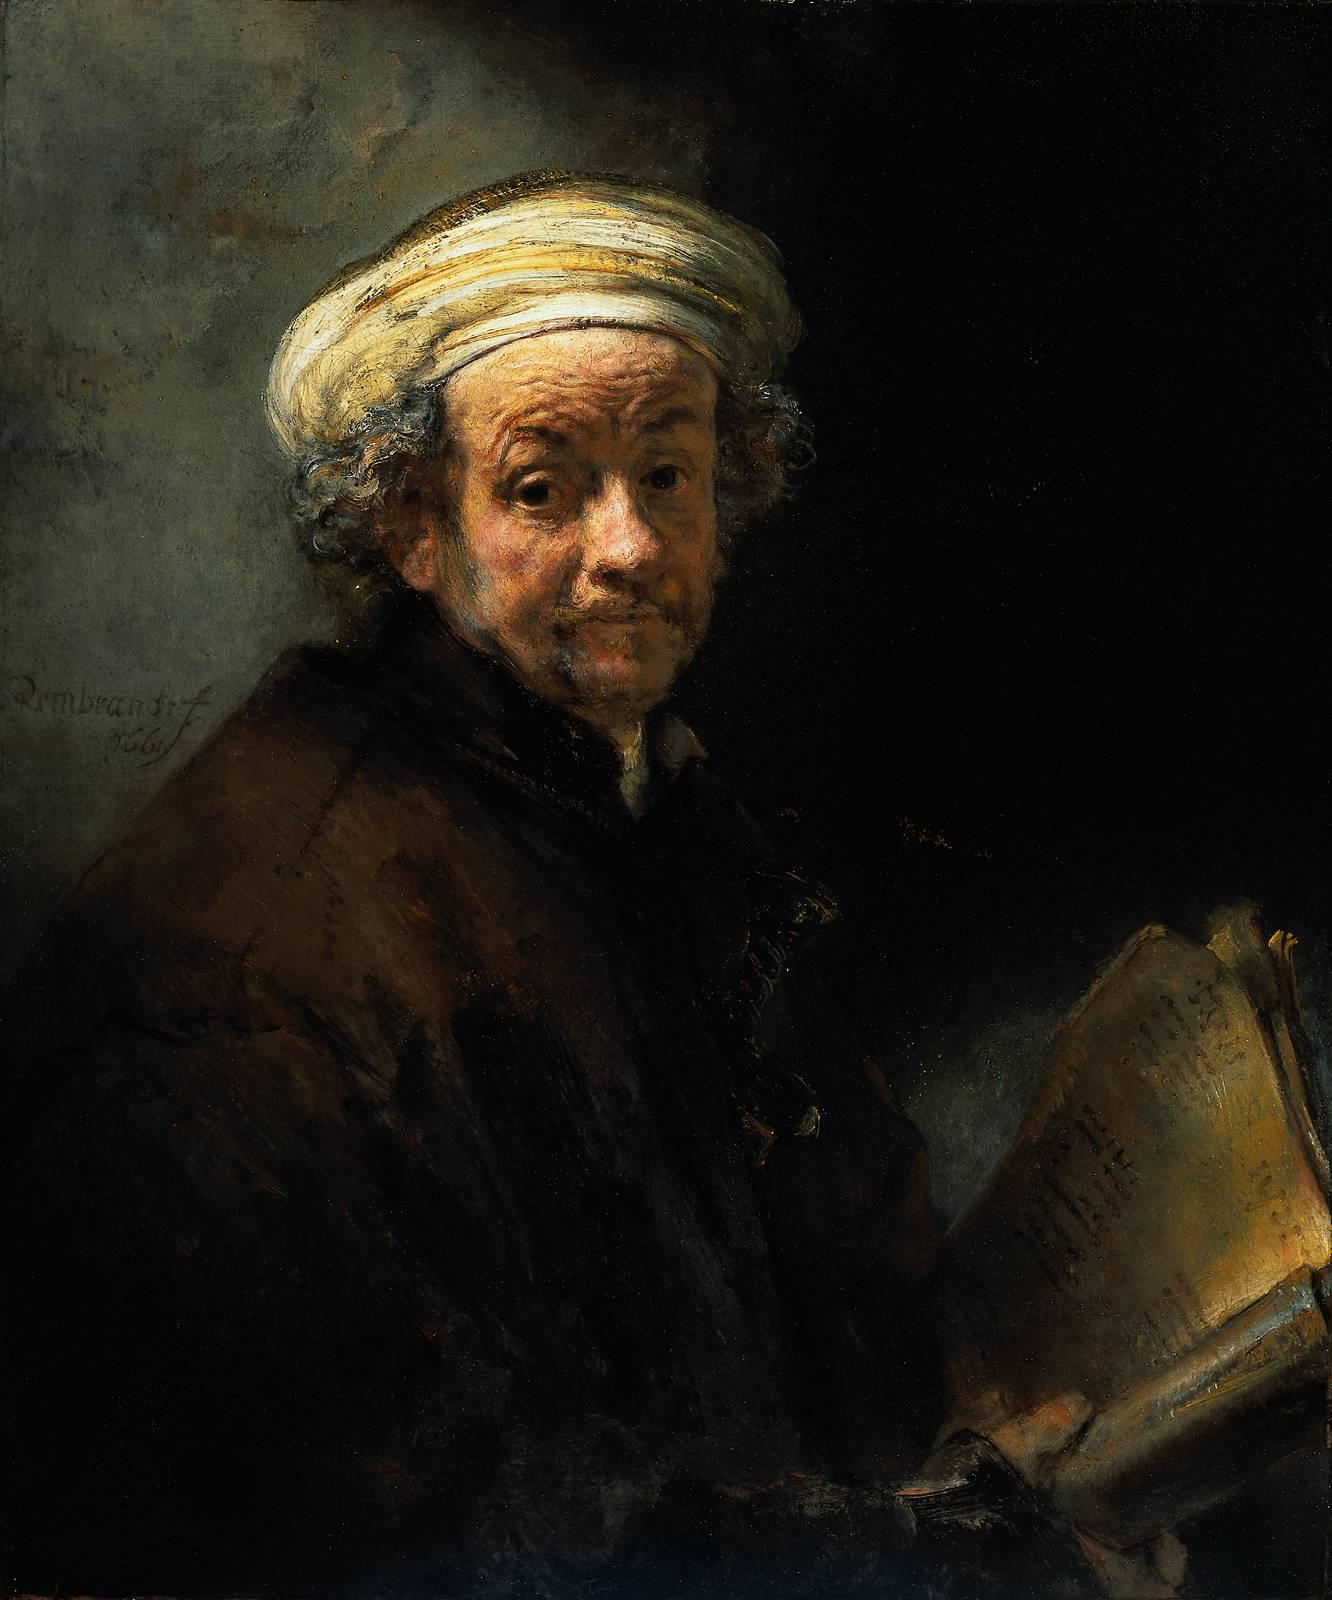 Starik-Rembrandt